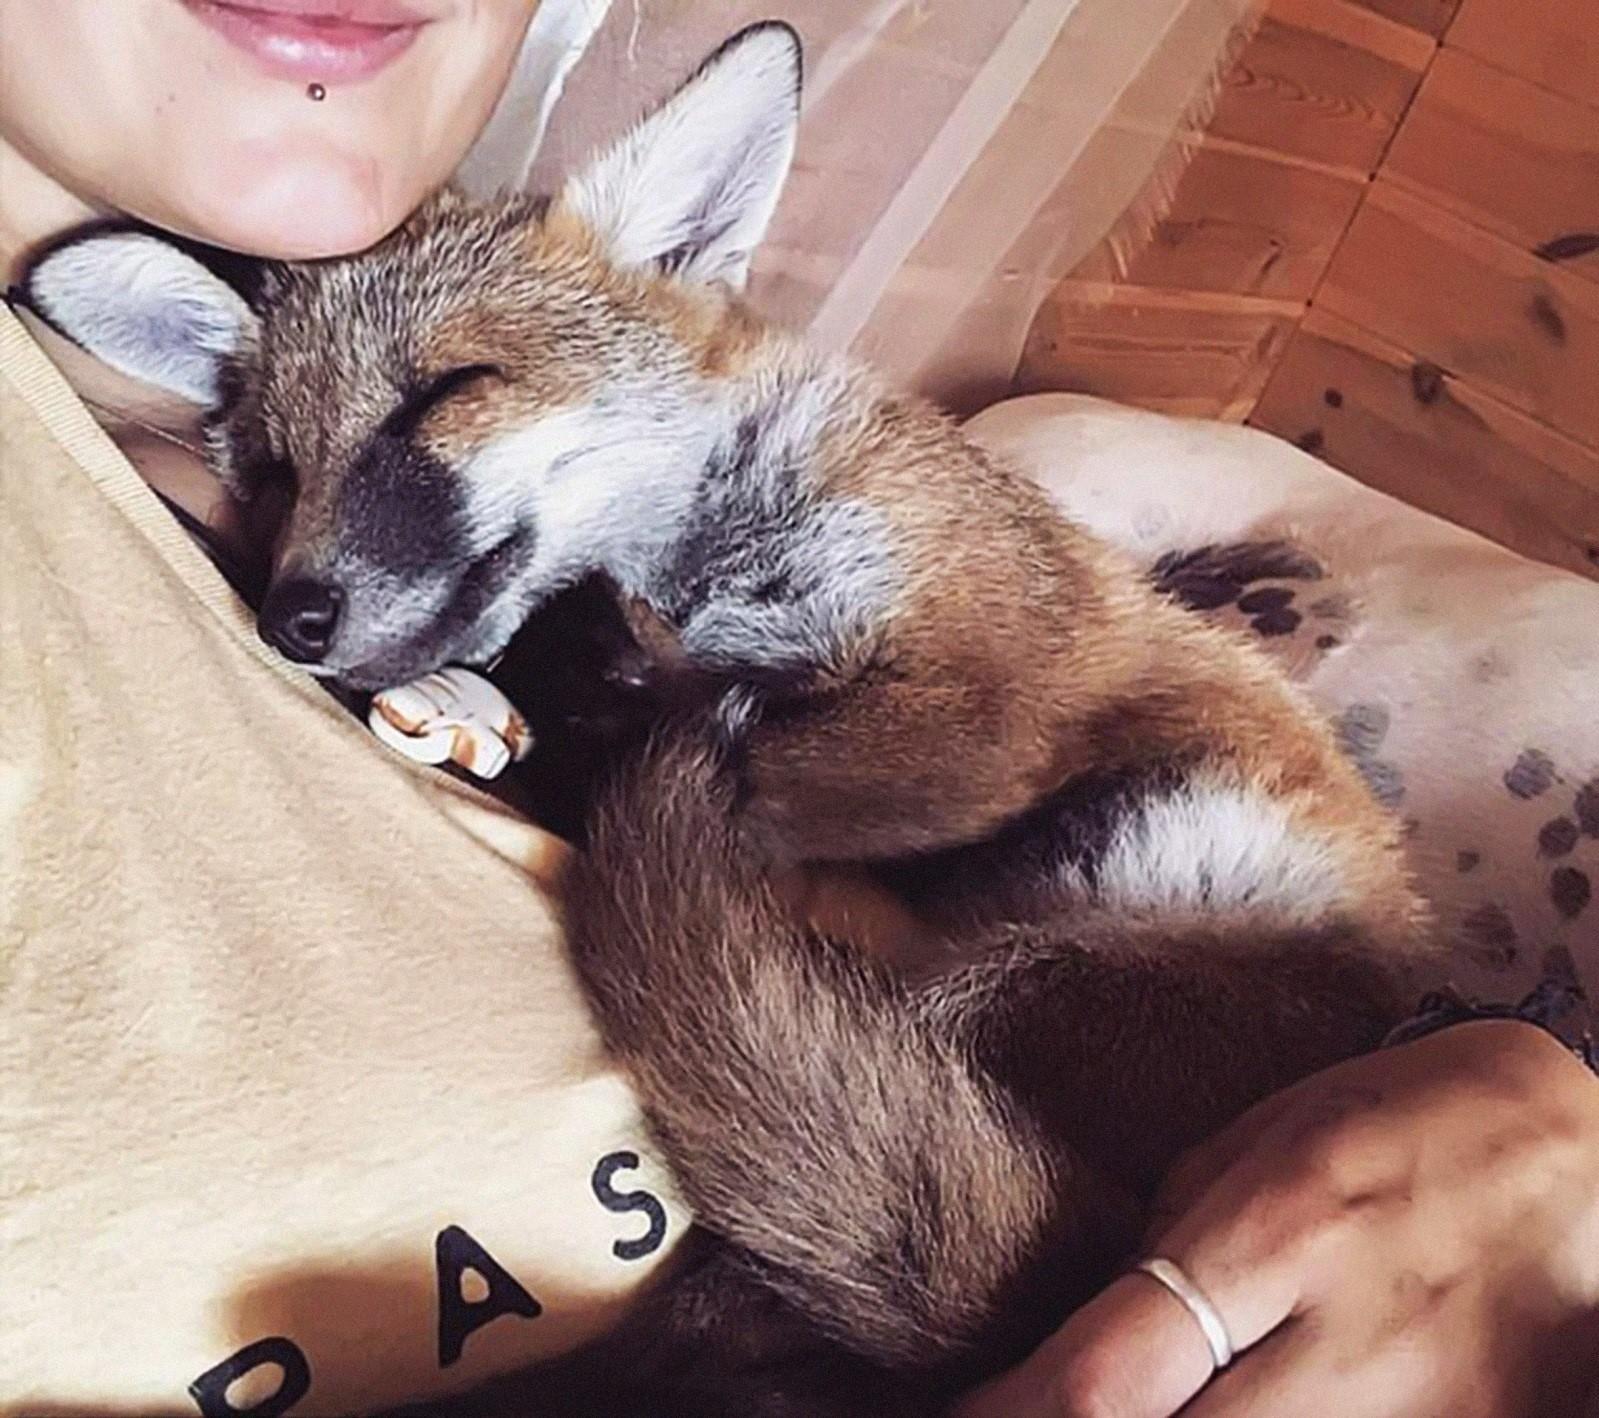 «Лис и пёс»: девушка спасла лисёнка и он стал лучшим другом её собаки